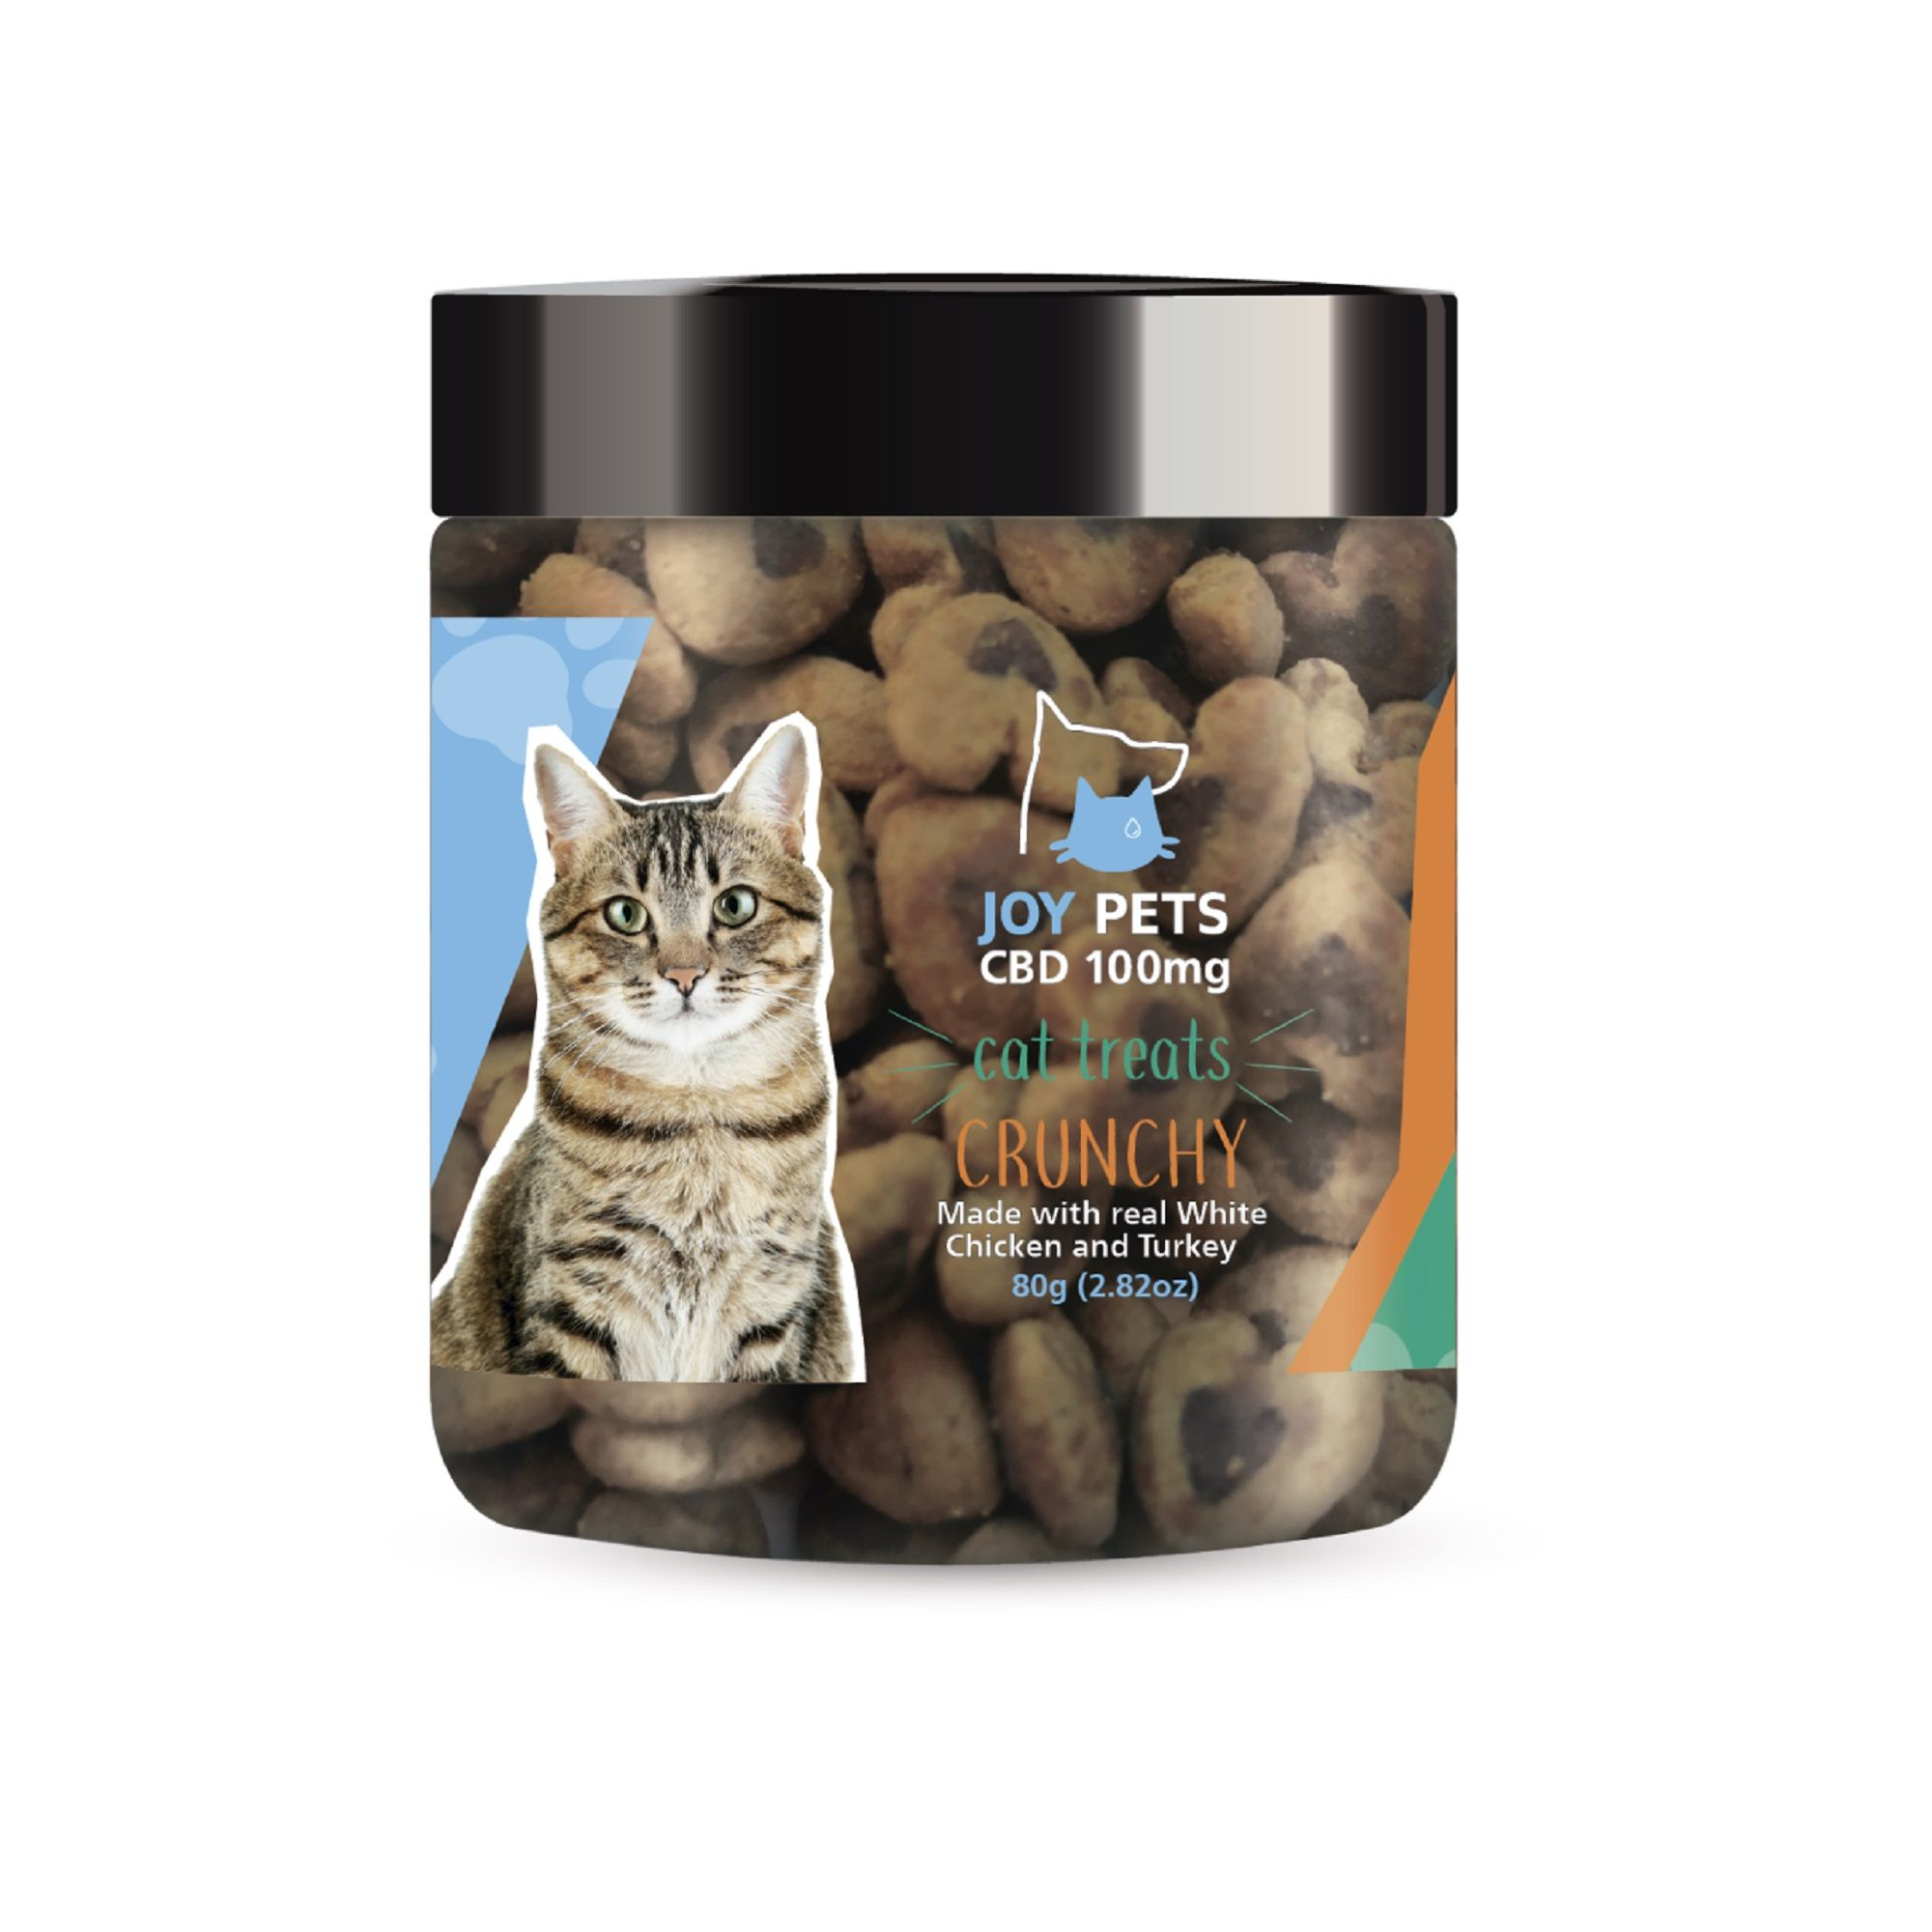 Joypets Cbd - Cat Treats - Crunchy 100mg Cbd Infused Treats For Anxious And  Nervous Cats - Buy Joy Pets Cbd Oil For Cats 25mg,Cat Treats 100% Organic,No  Thc Product on Alibaba.com